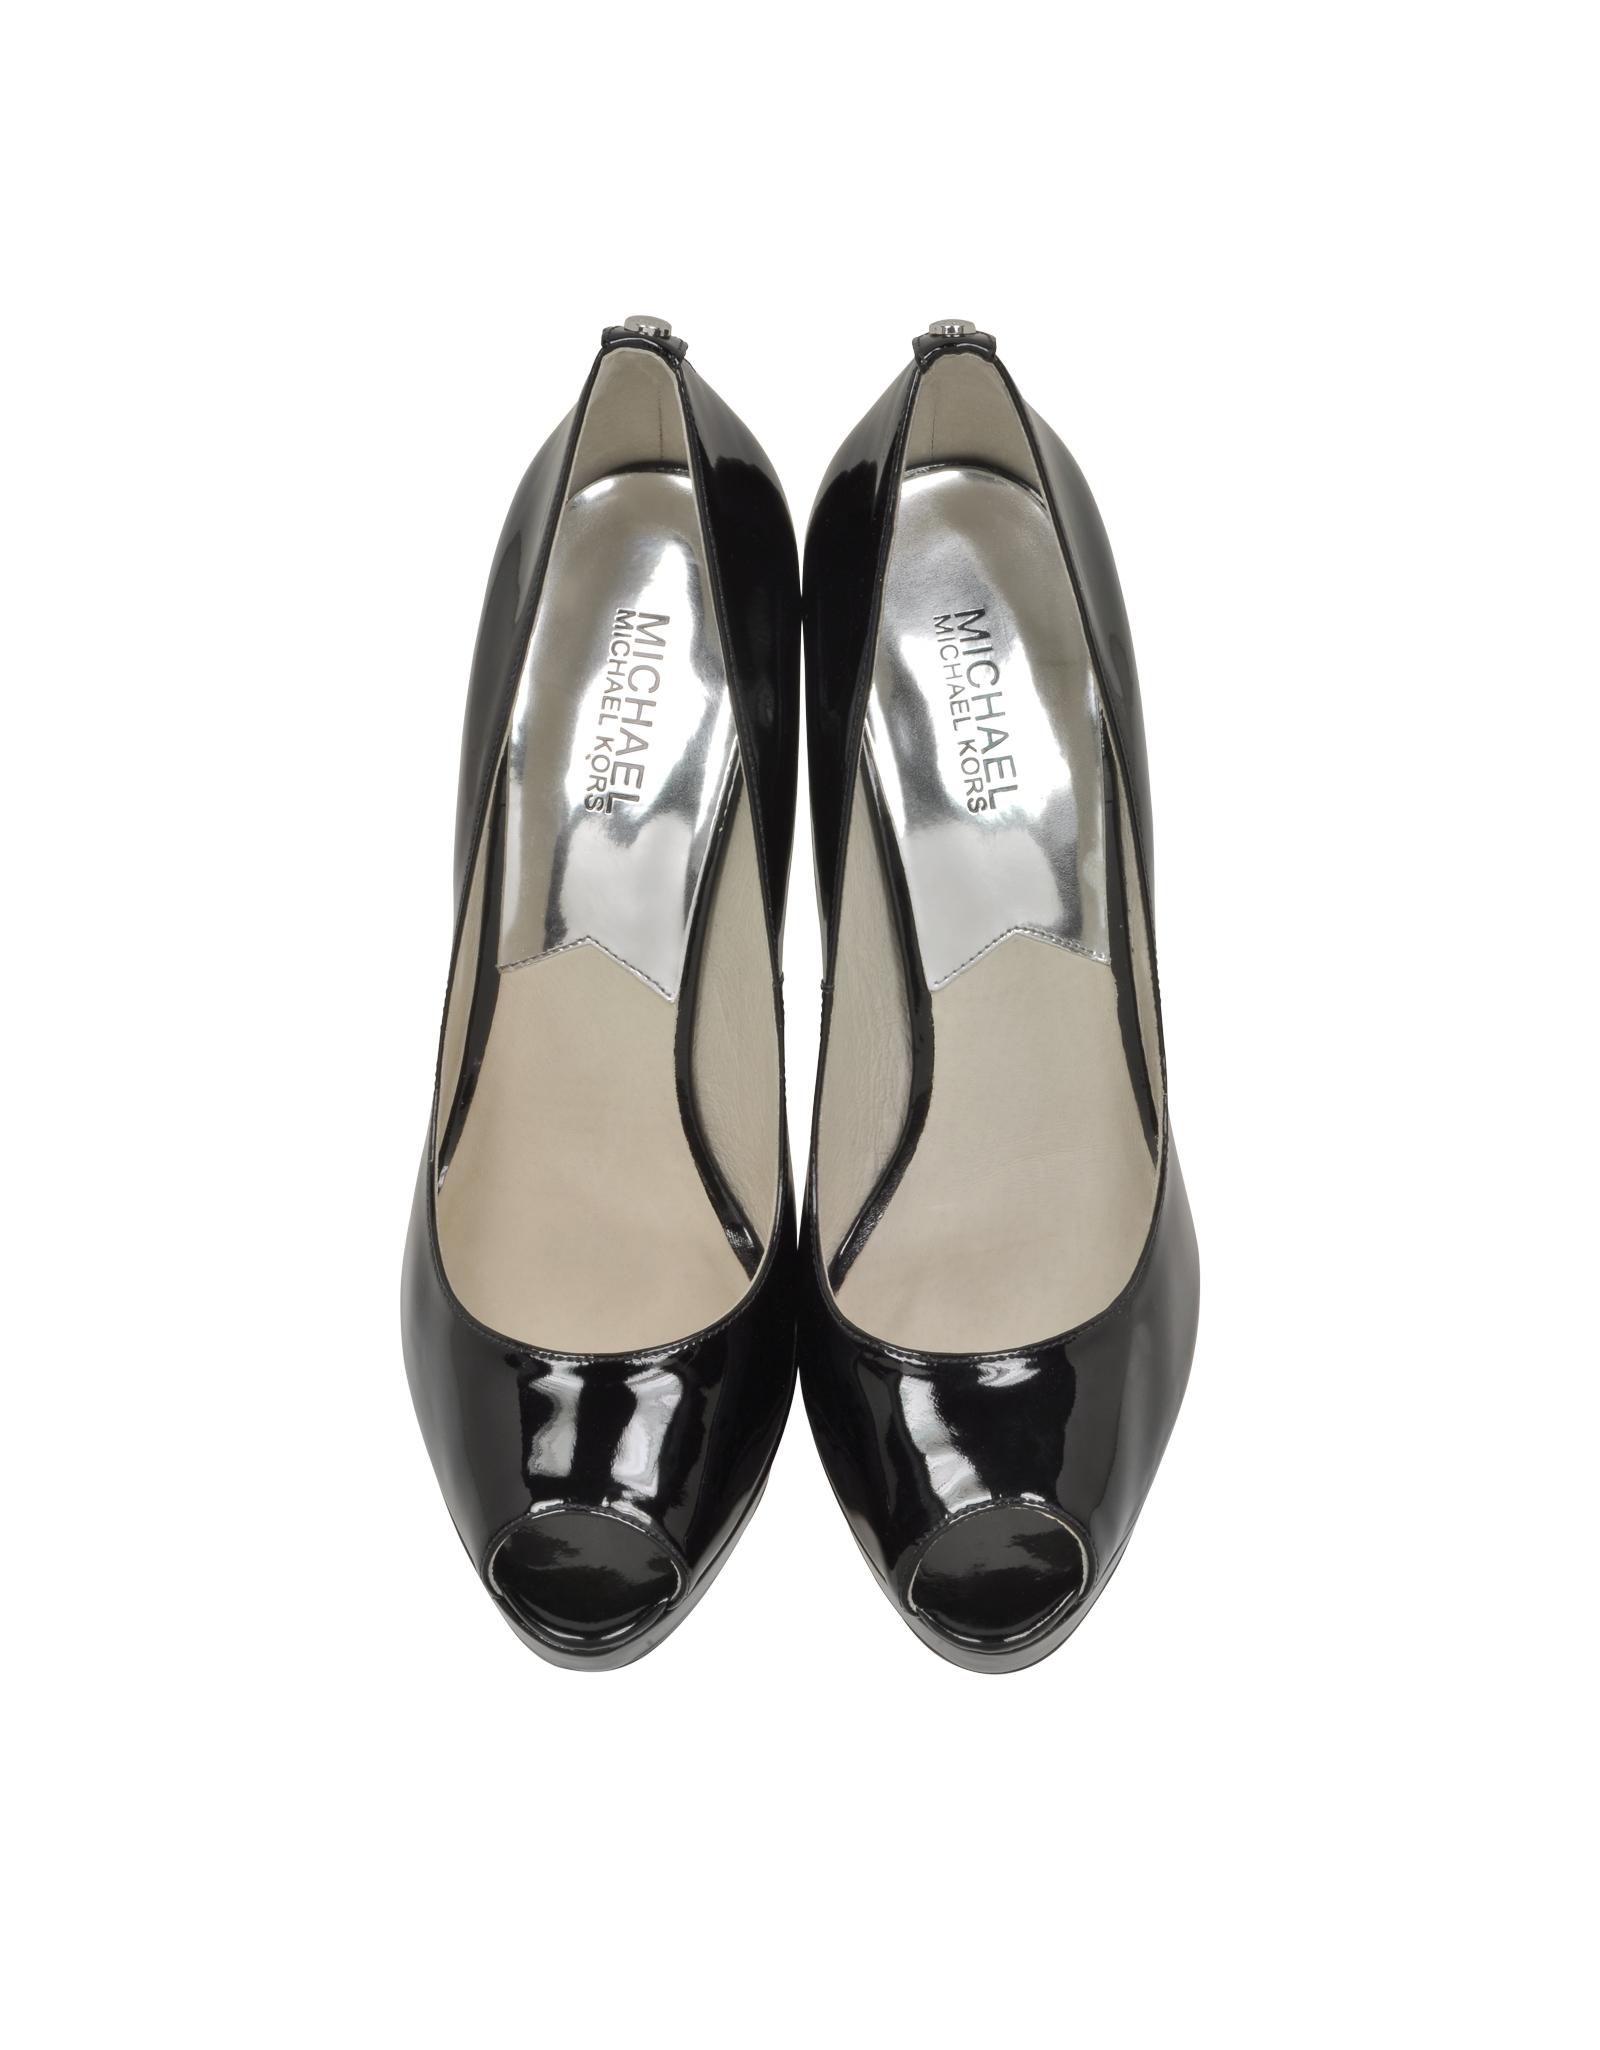 michael kors york black patent leather platform shoe in